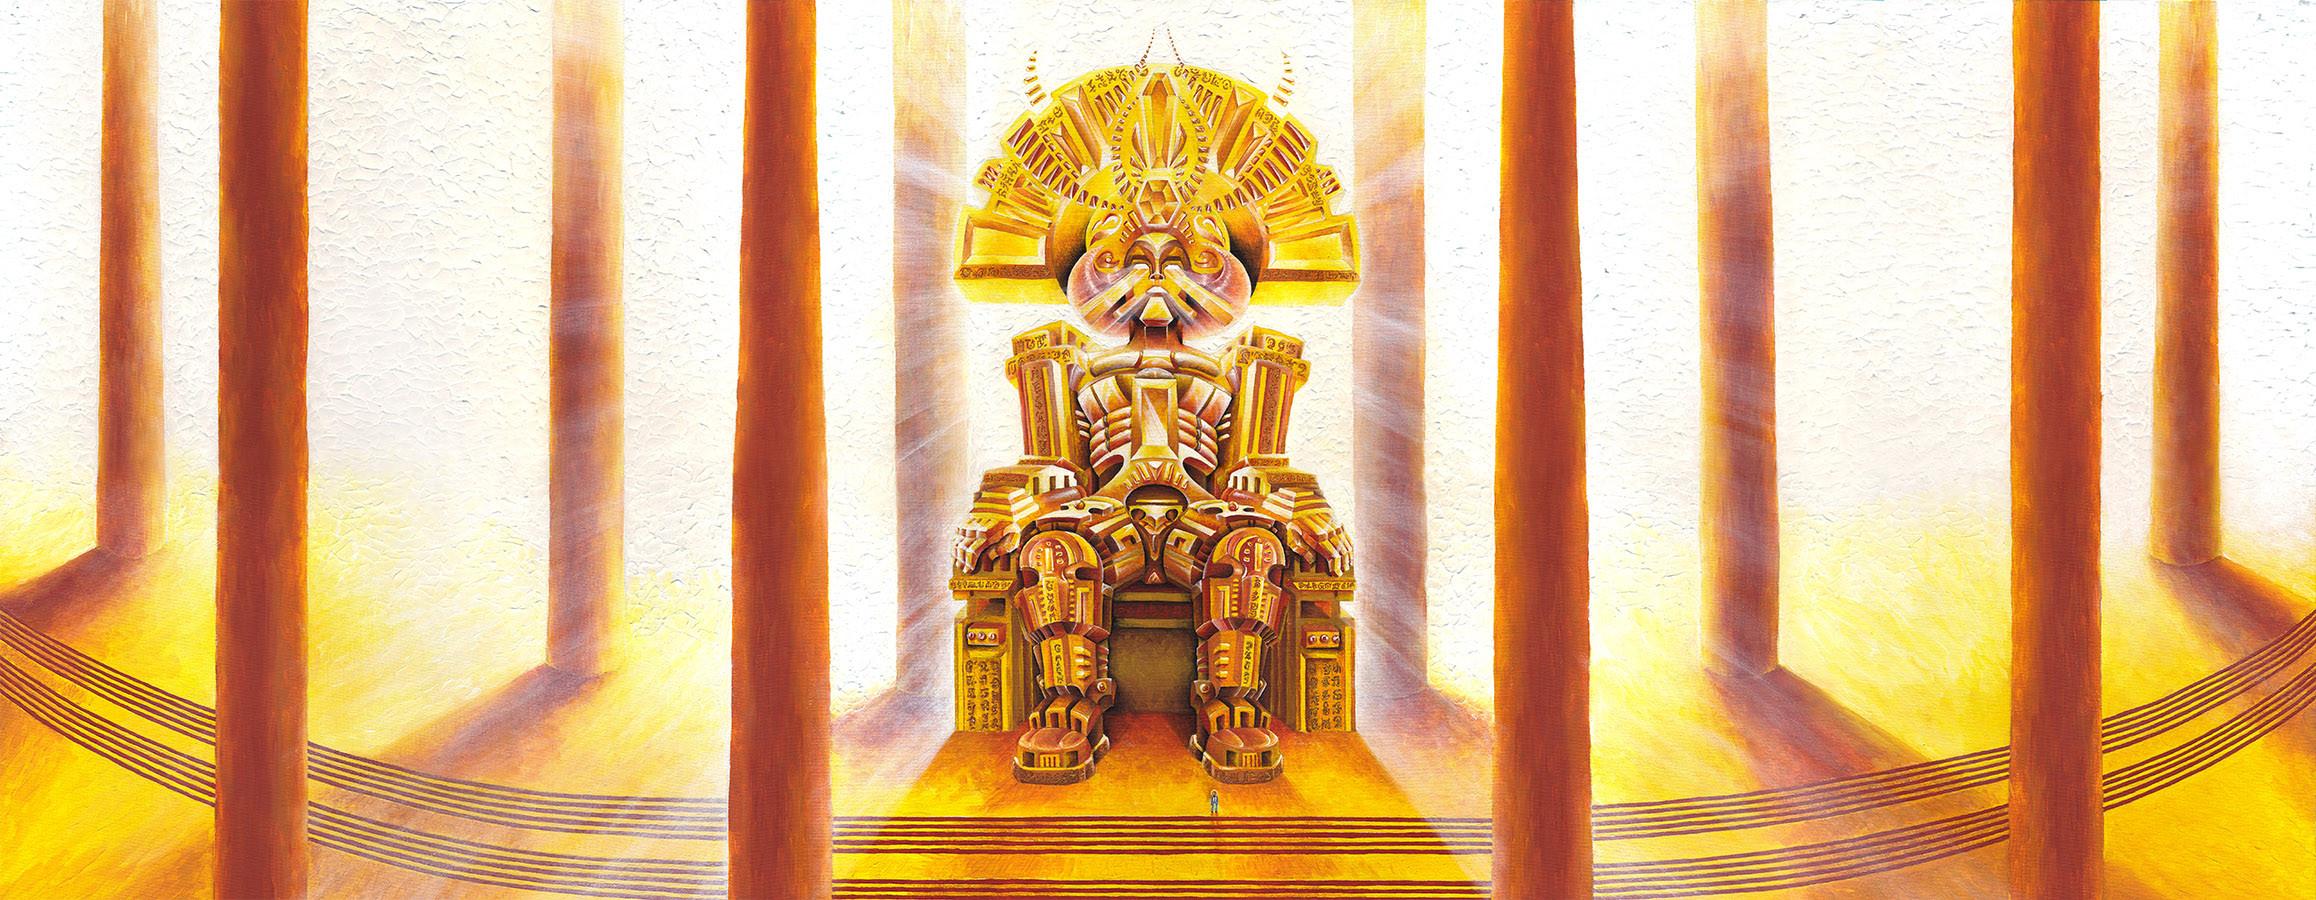 Храм Бога-Светотворца (триптих)